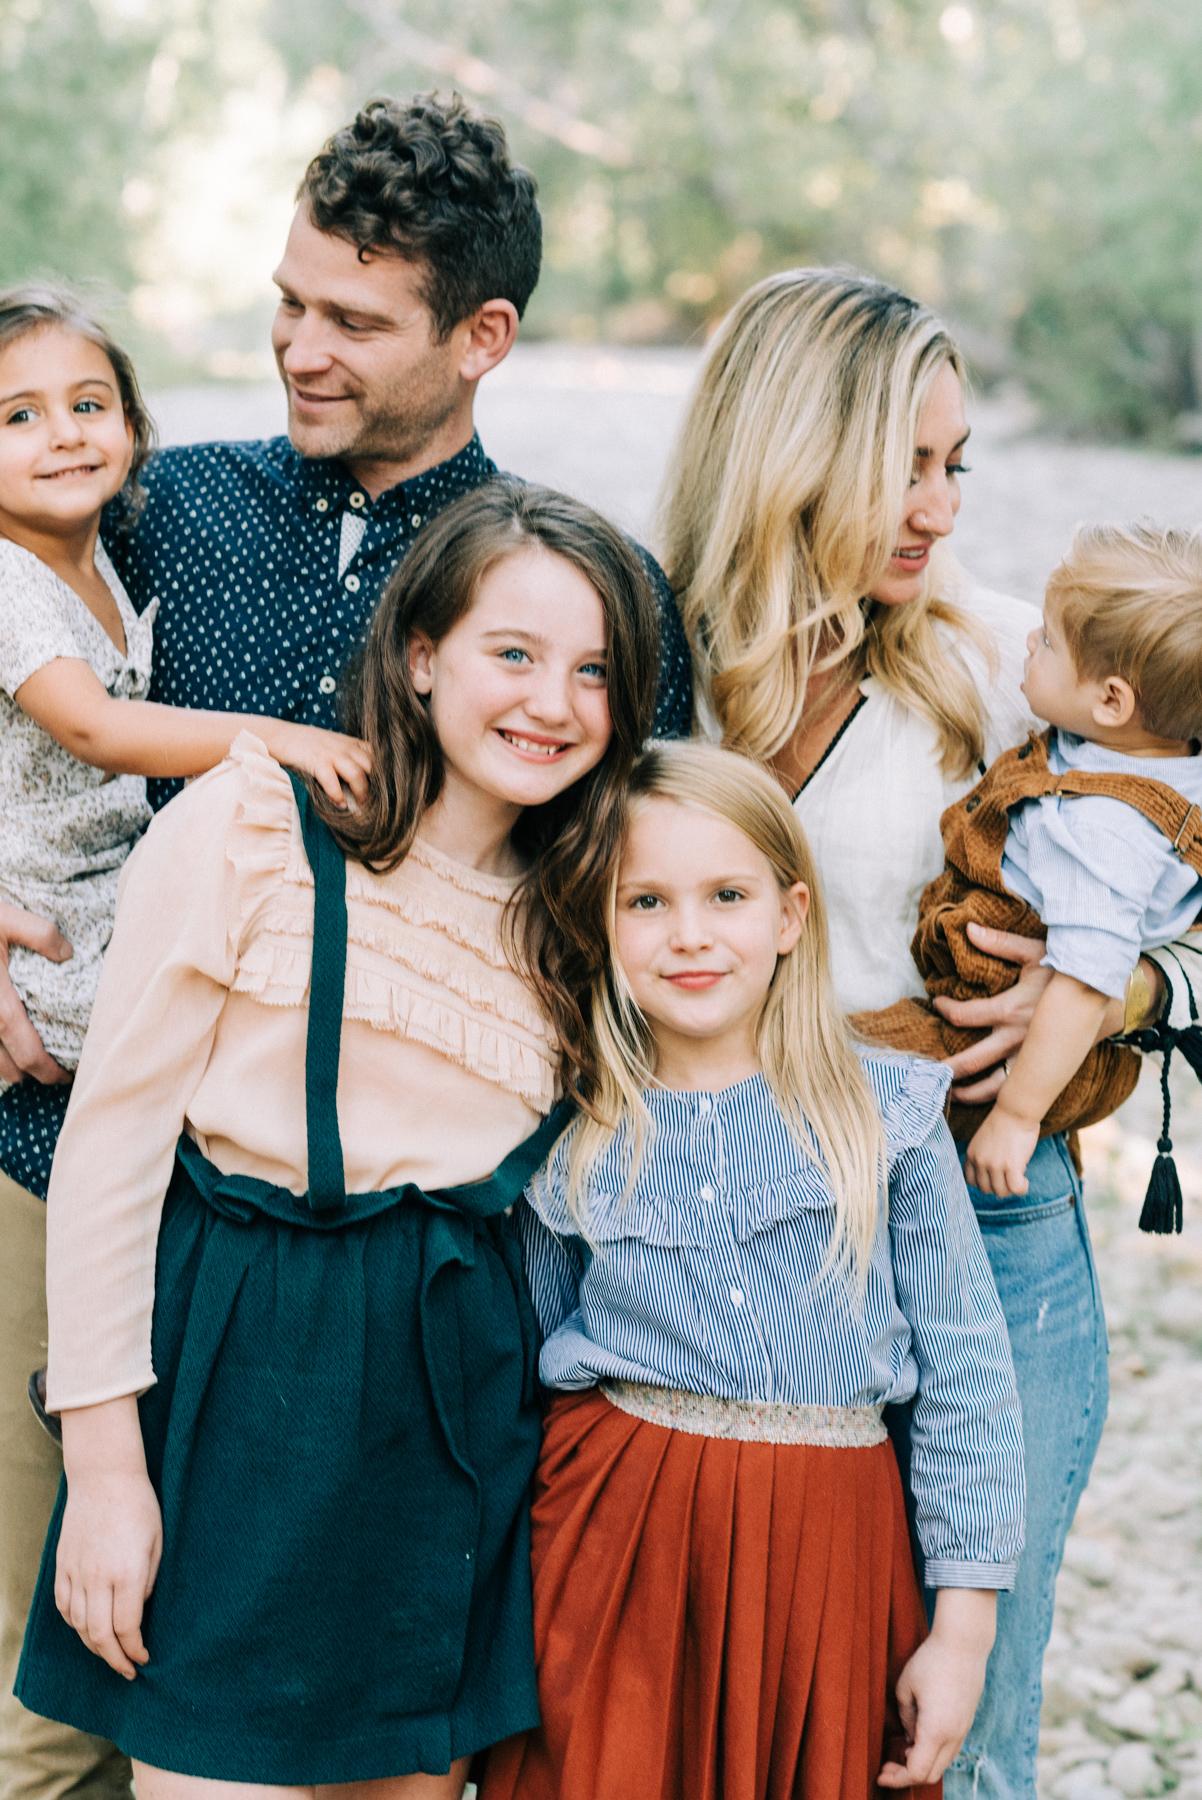 Ben+Joella_Families_15.jpg